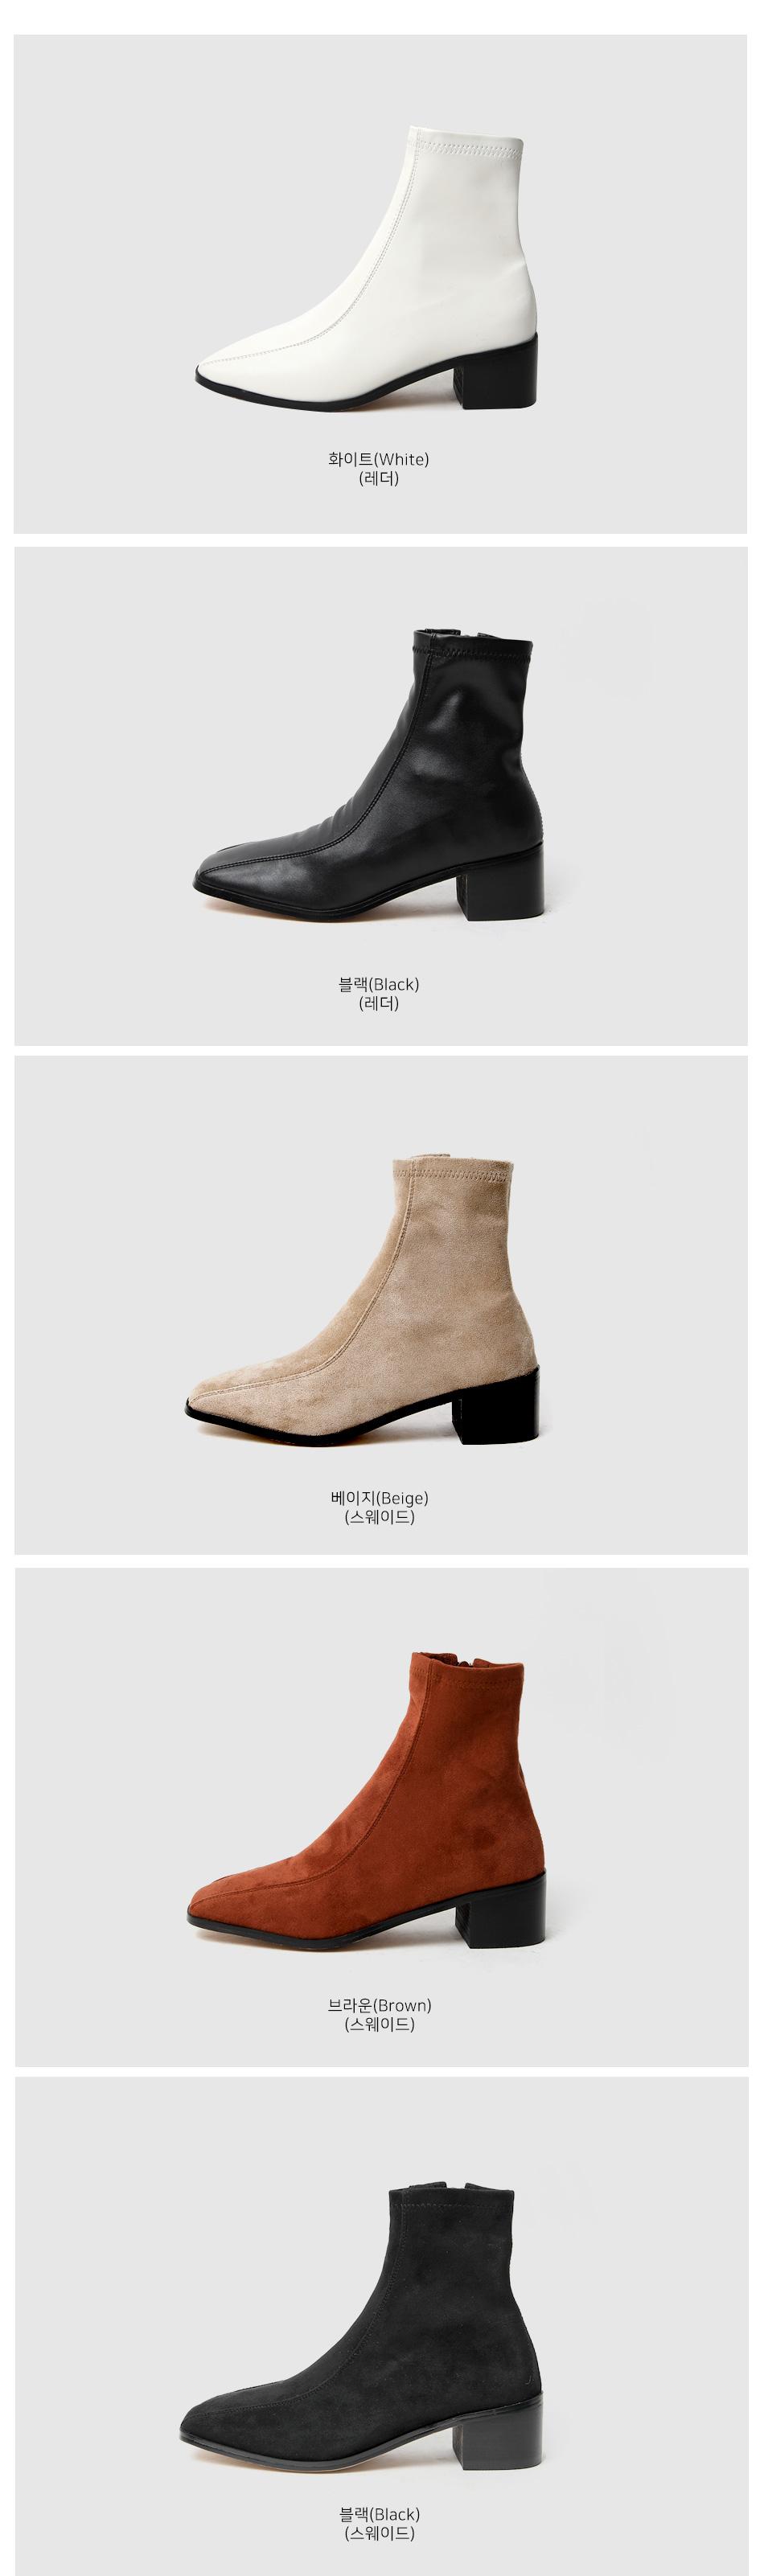 Piek socks ankle boots 4cm